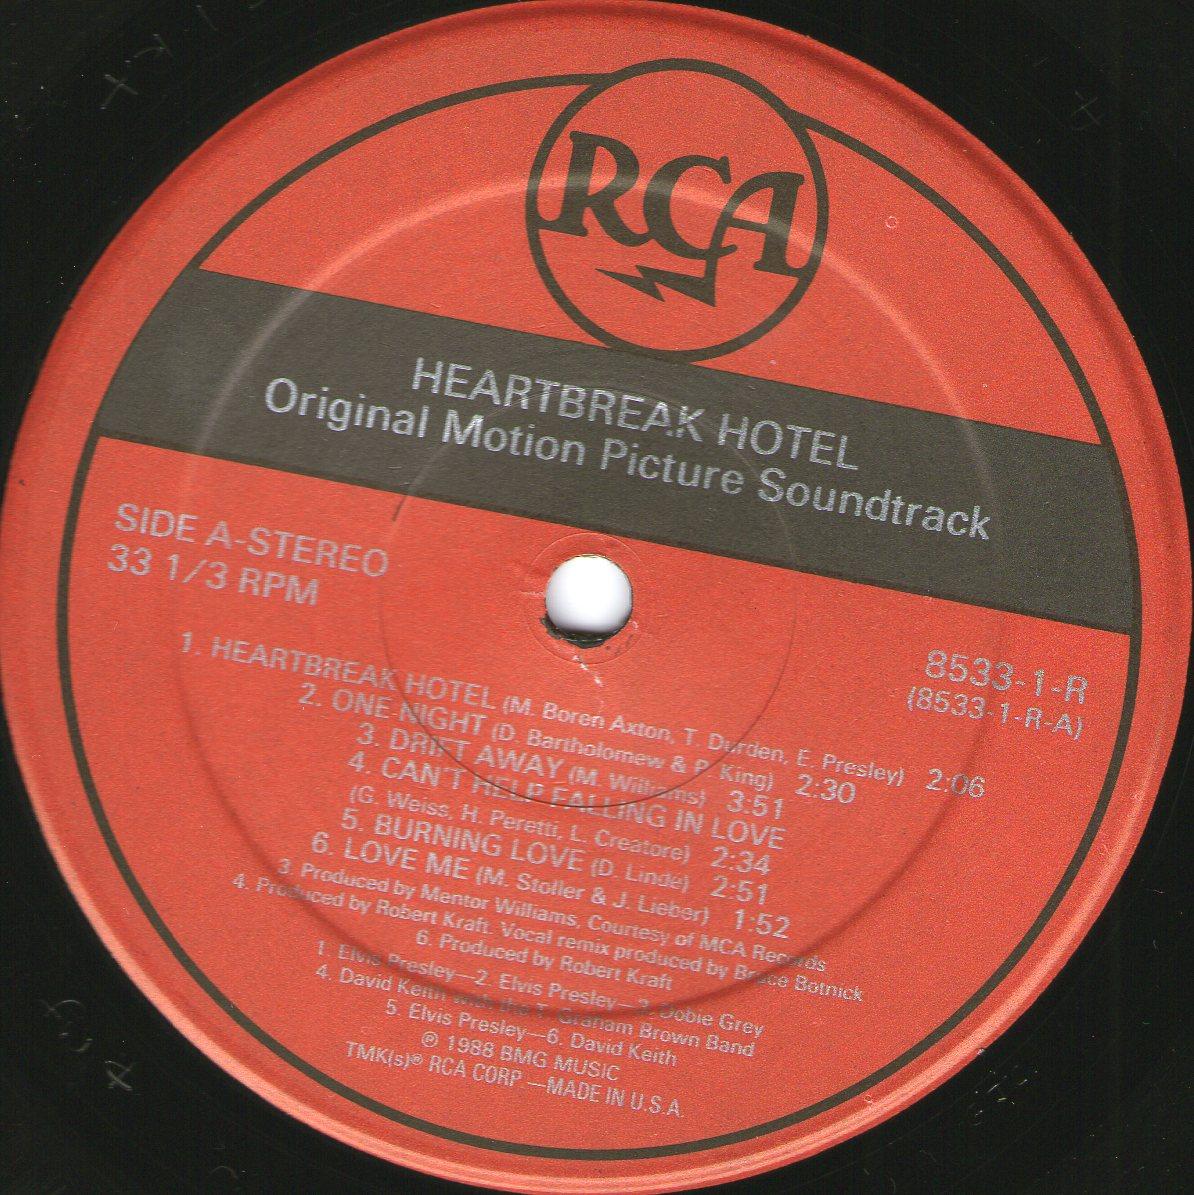 HEARTBREAK HOTEL - A ROCK'N'ROLL FANTASY Img0827sfkv